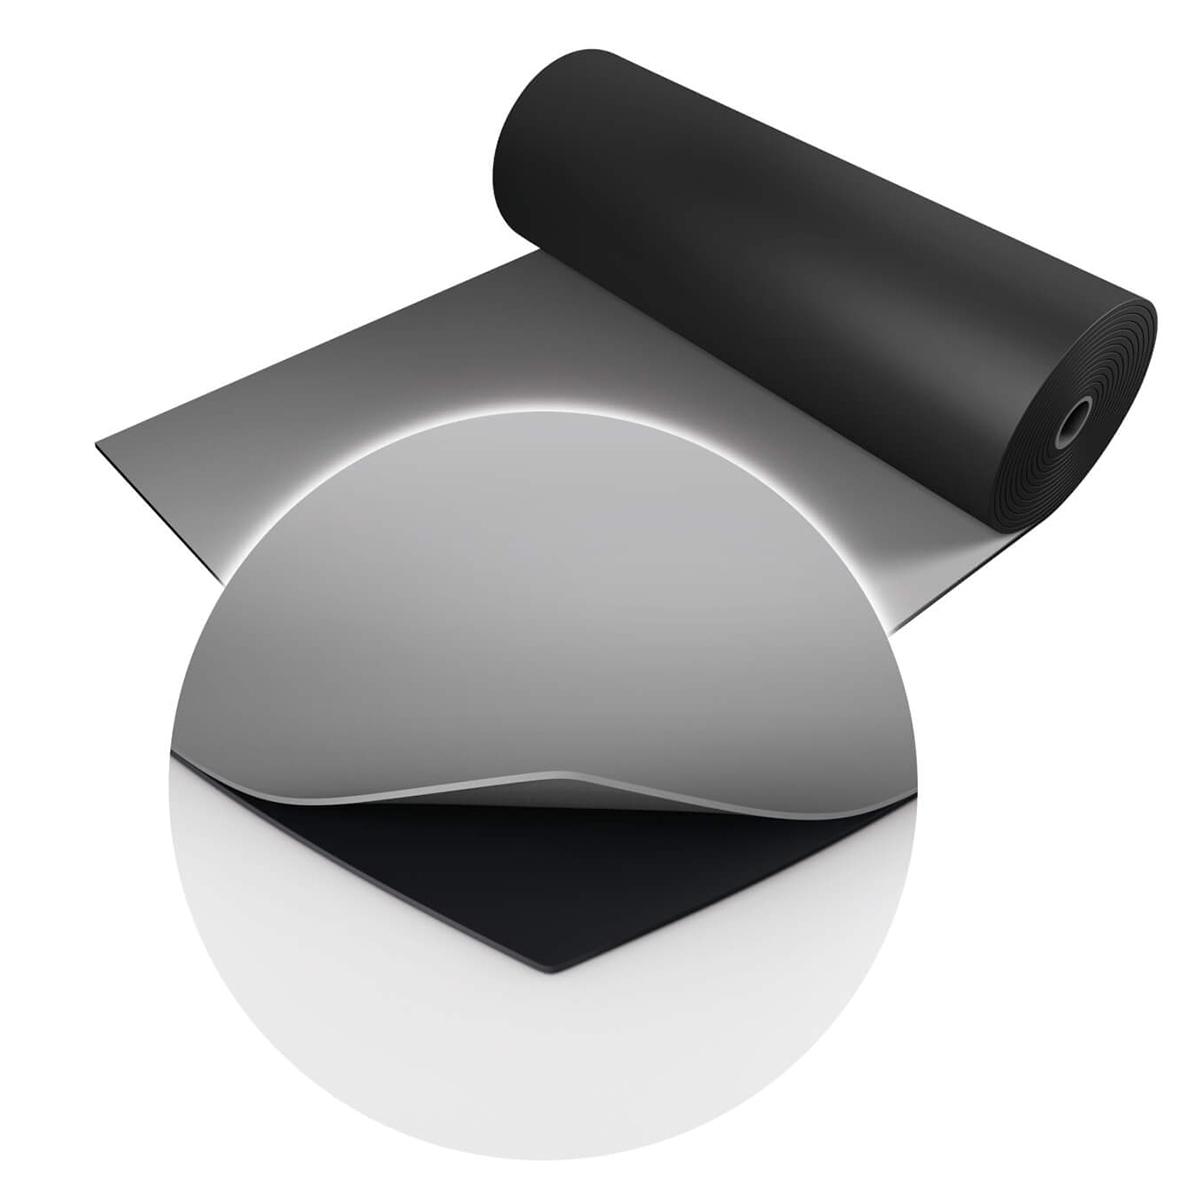 Two Stage dubbelzijdige dansvloer 2m x 15m zwart / grijs